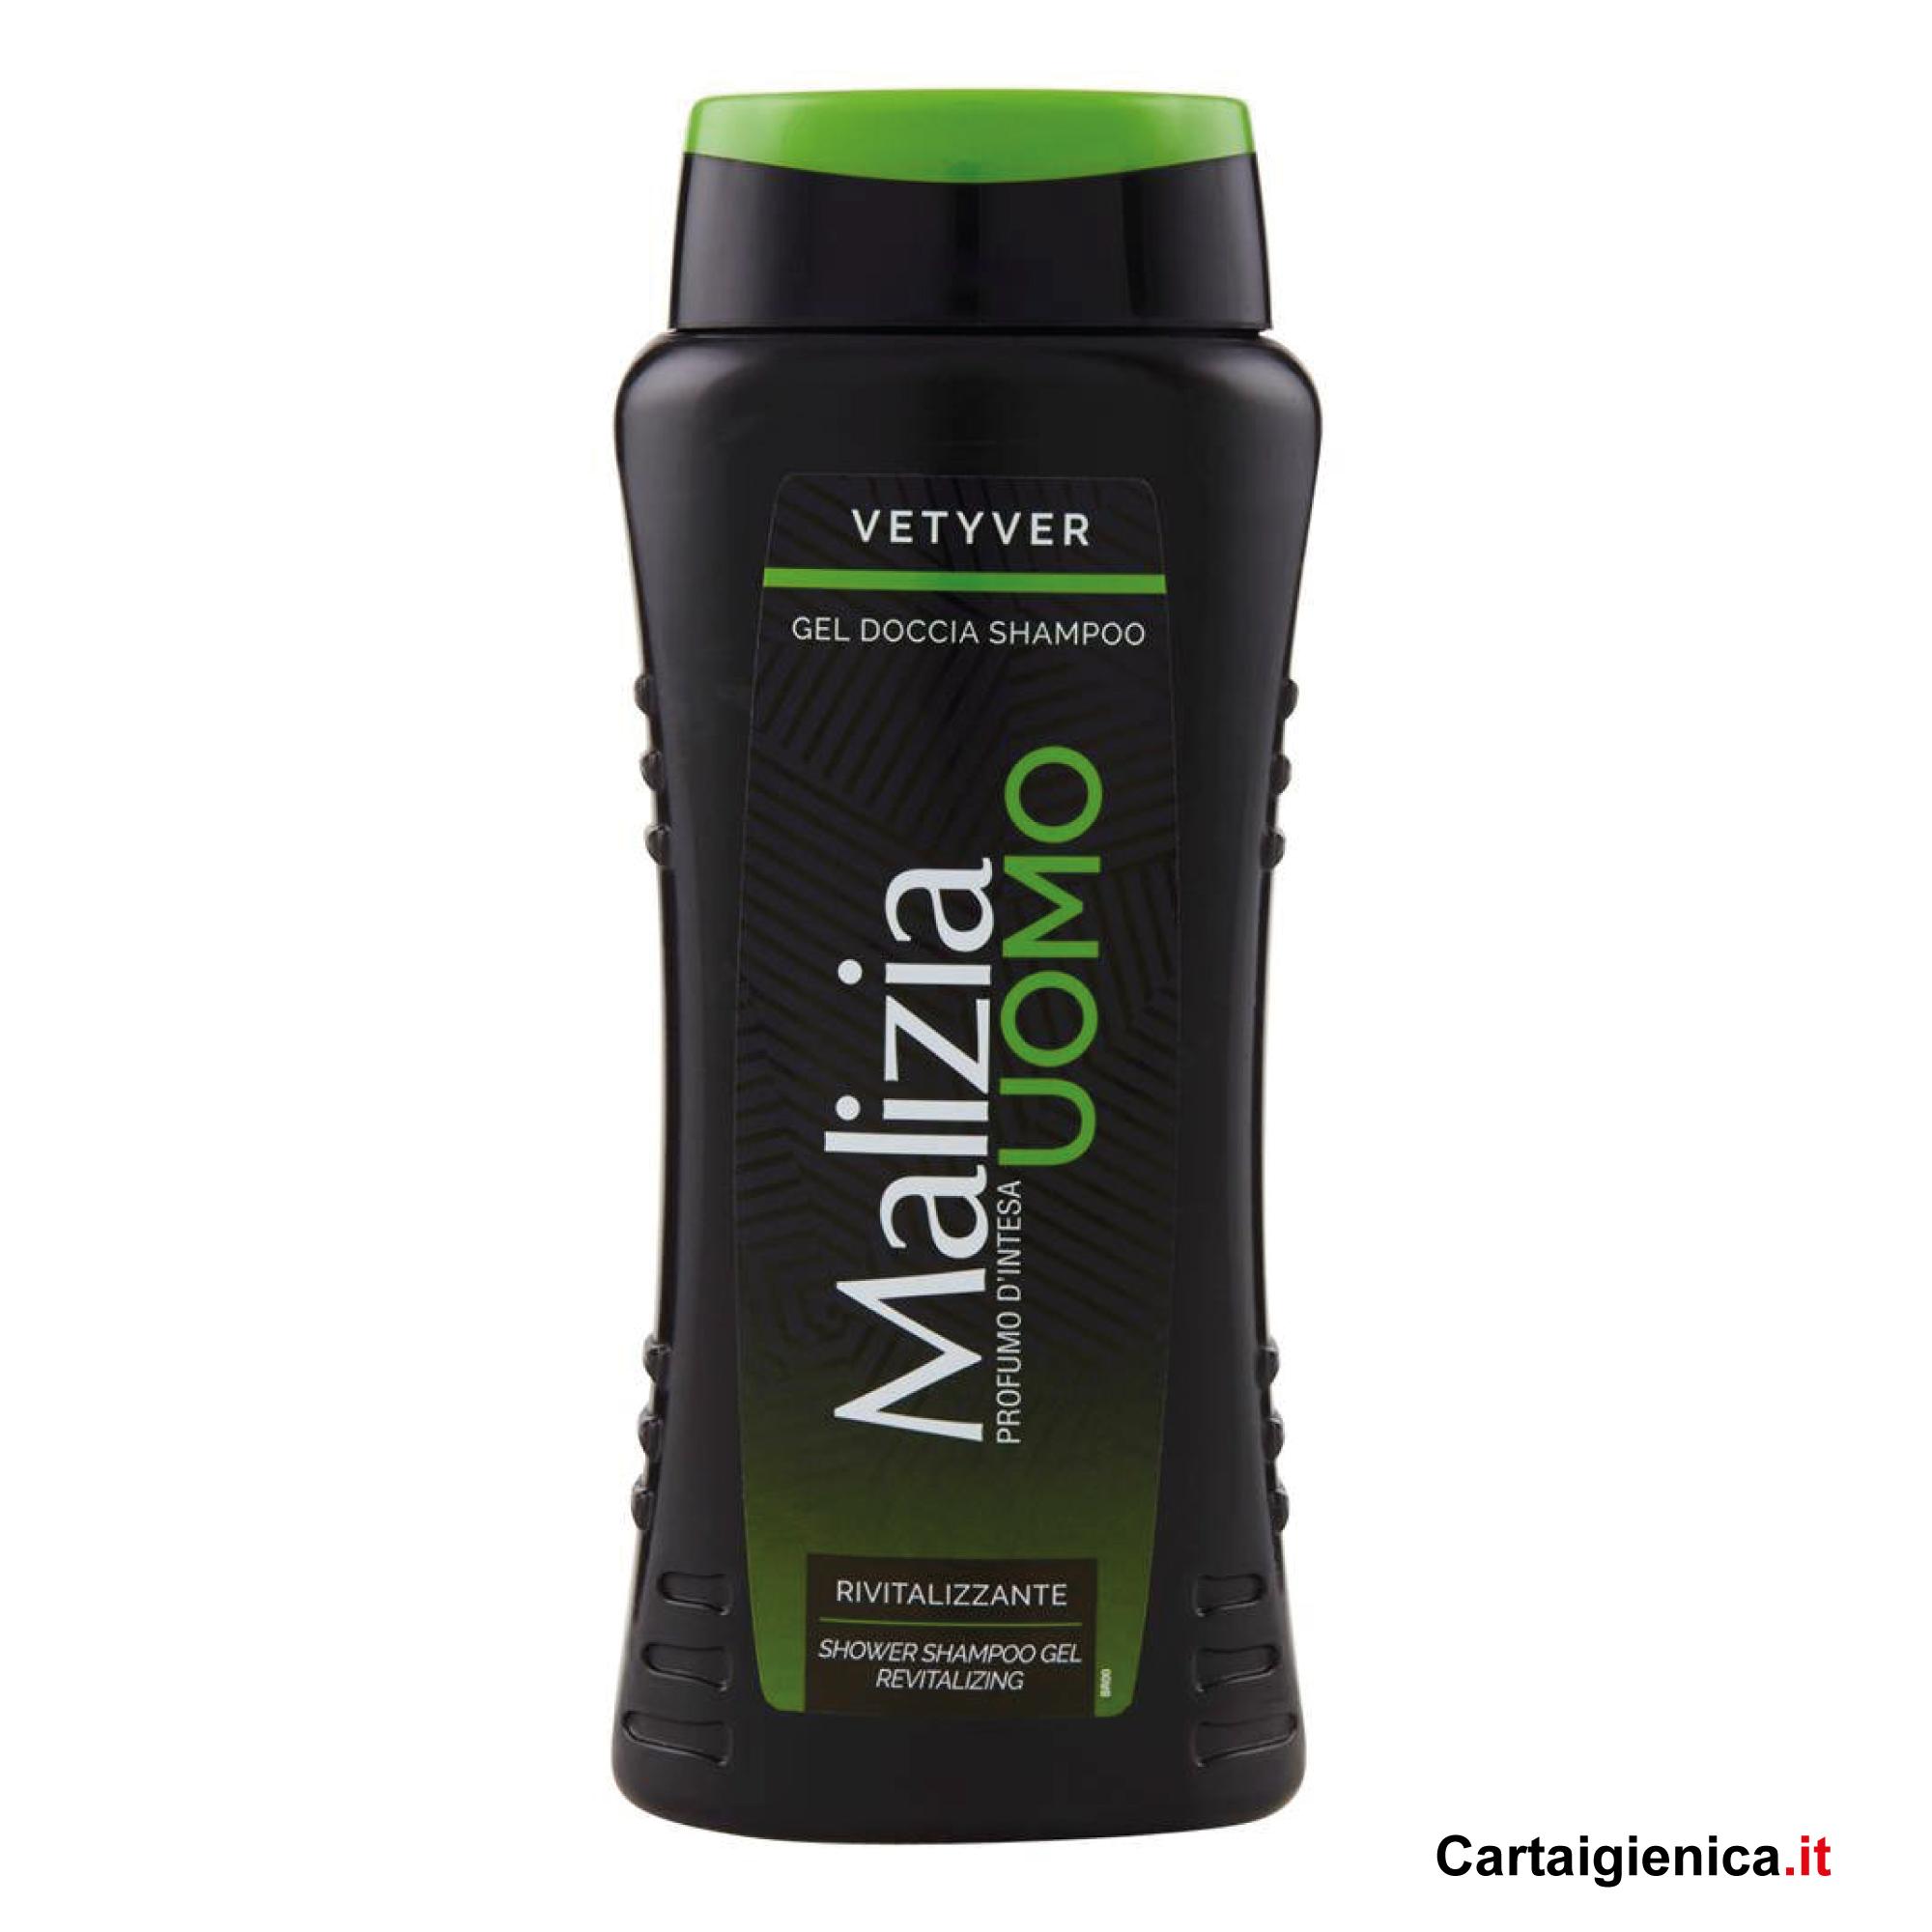 malizia uomo vetyver gel doccia shampoo rivitalizzante 250 ml